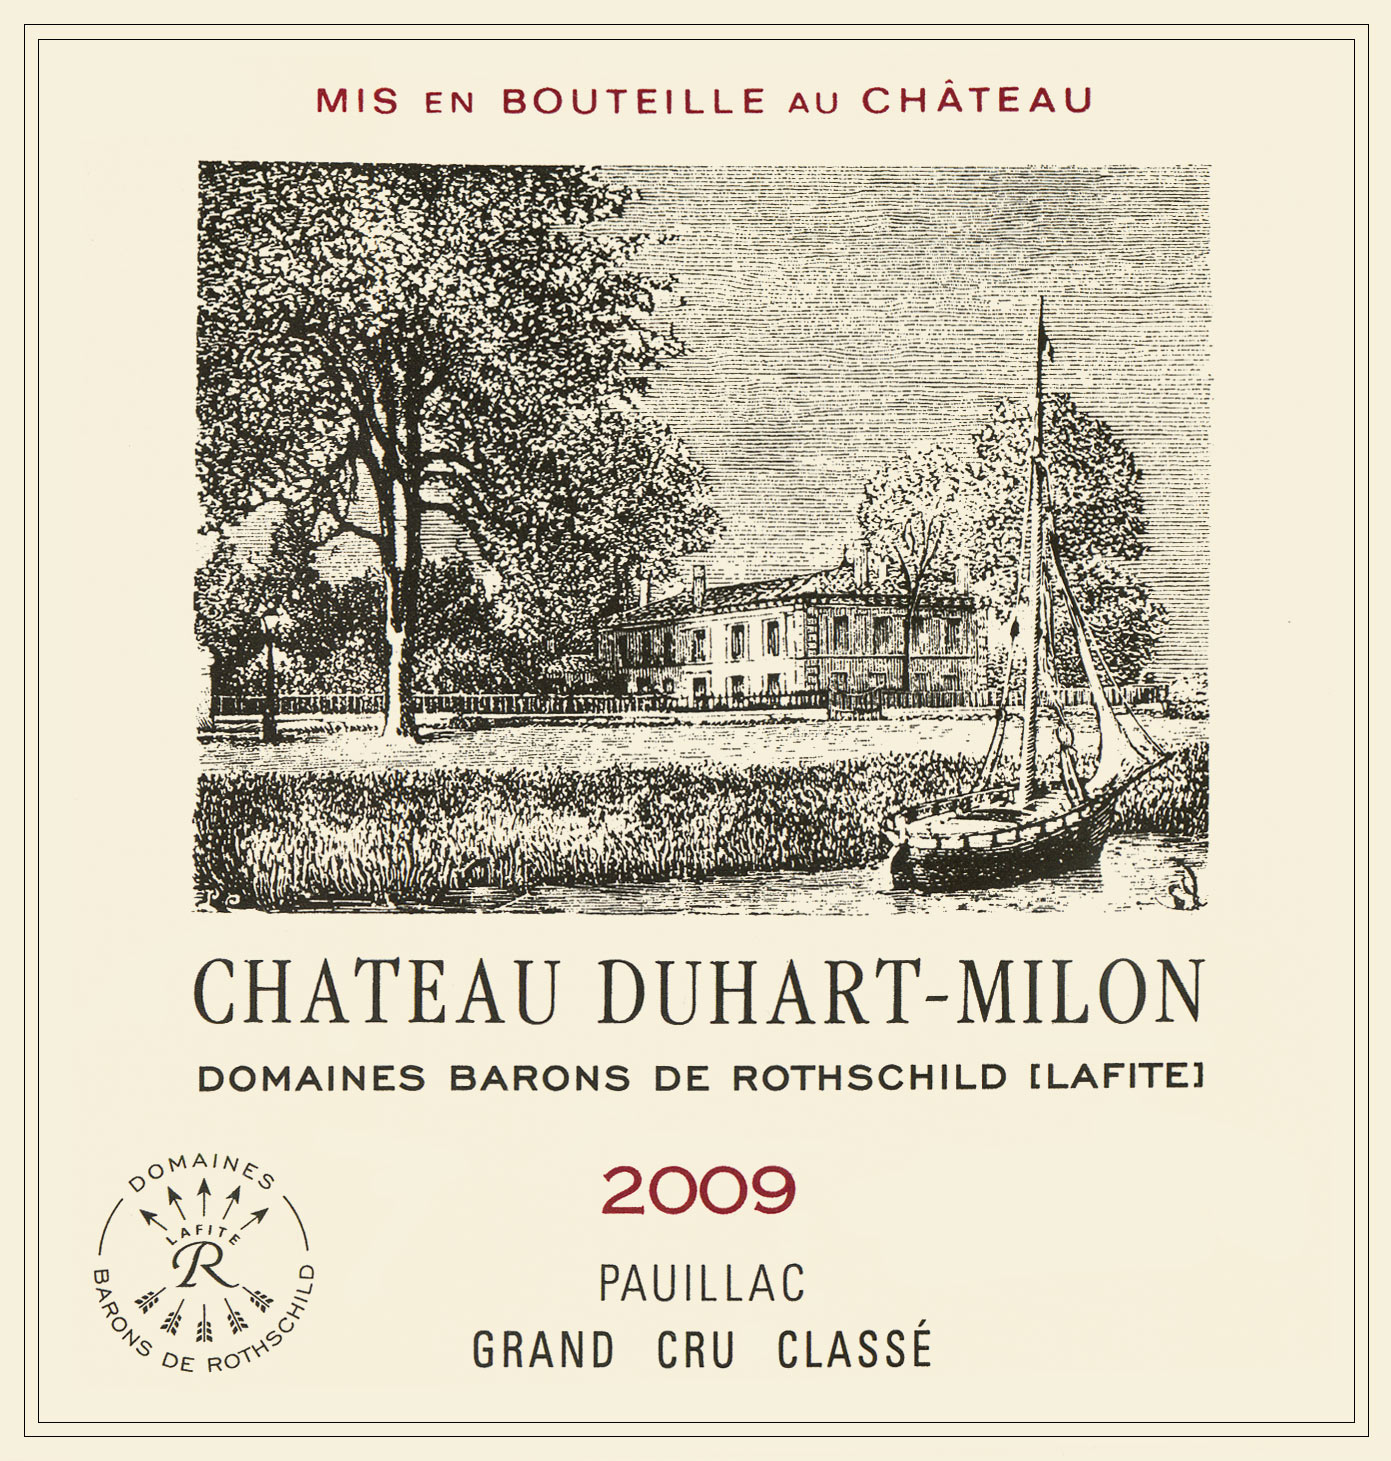 都夏美隆酒庄干红Chateau Duhart-Milon